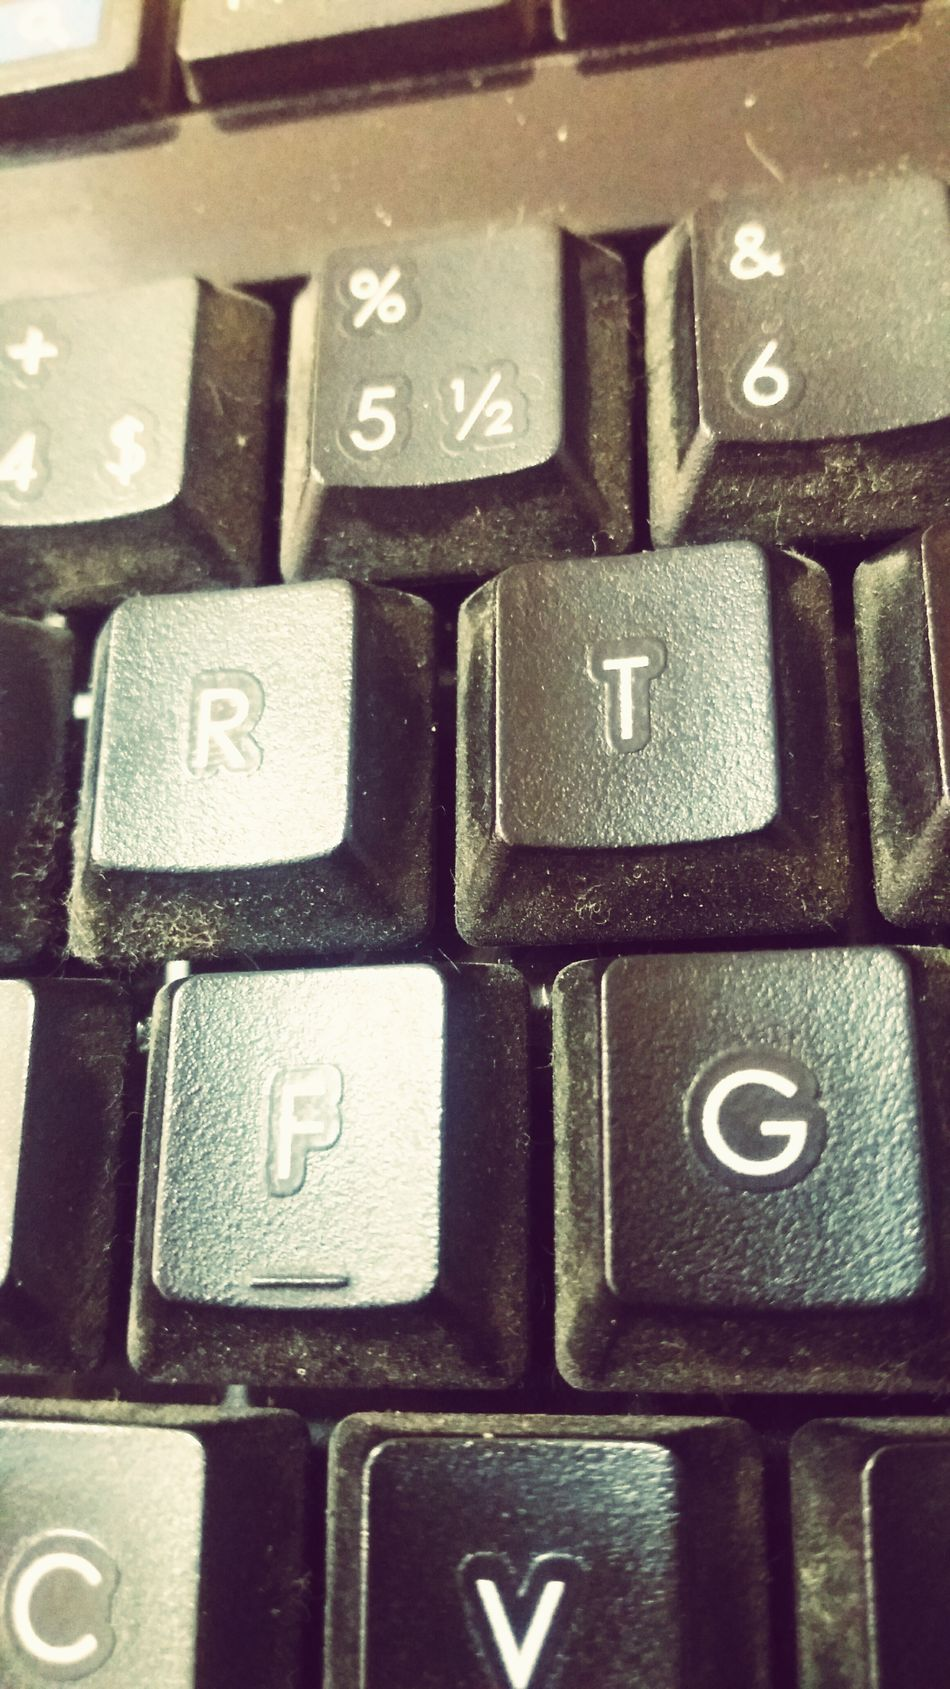 So Old  Old Oldkeys Oldkey Unclean Notclean Keyboard Keyboards Key Keys Atwork In Work Blackkeyboard Blackkeys